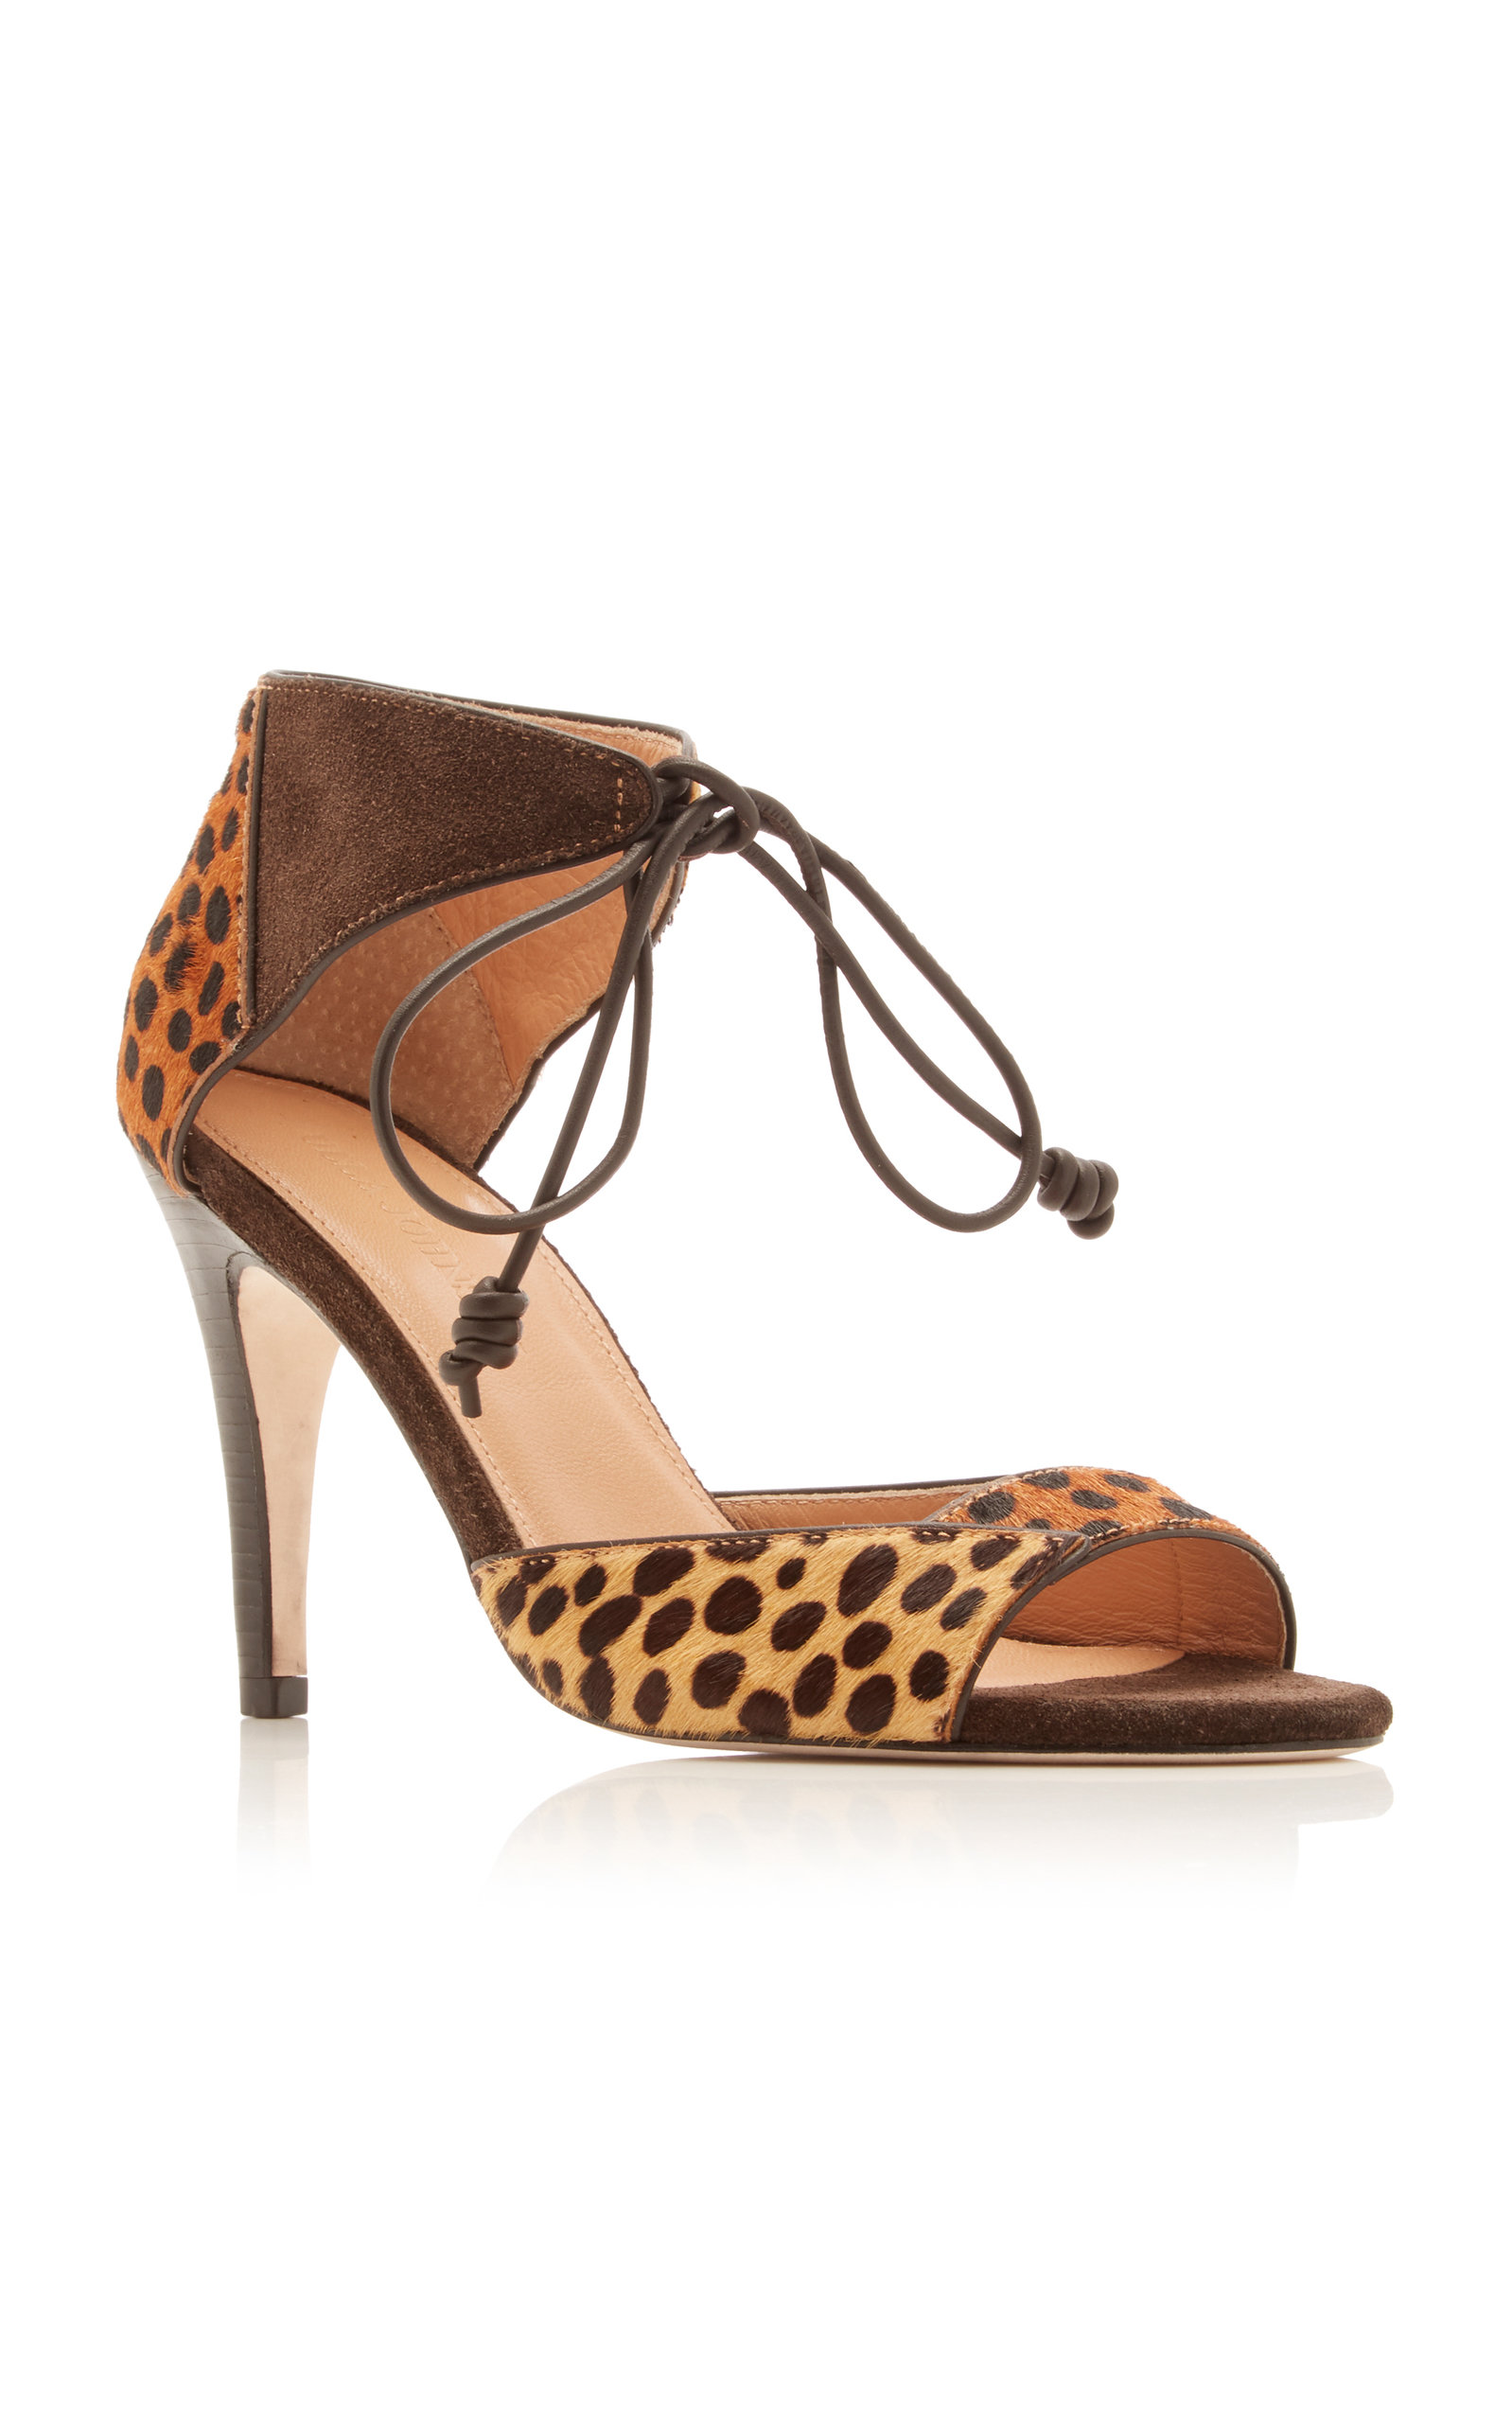 90d6330f4007 Ulla JohnsonMischa Leopard Sandals. CLOSE. Loading. Loading. Loading